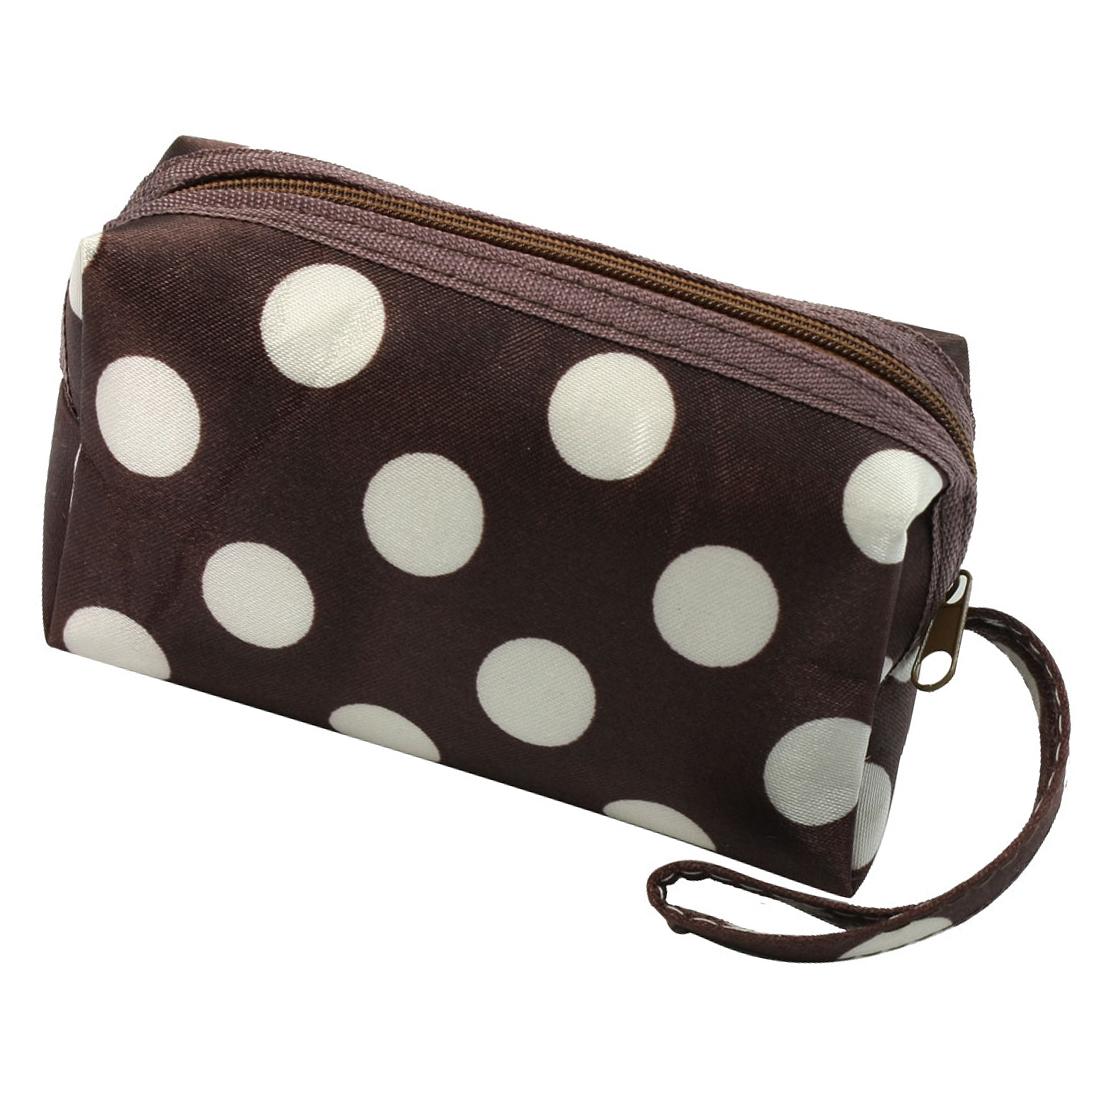 #19g New Men/'s Genuine Leather Bifold Credit//ID Cards Holder Slim Wallet purse